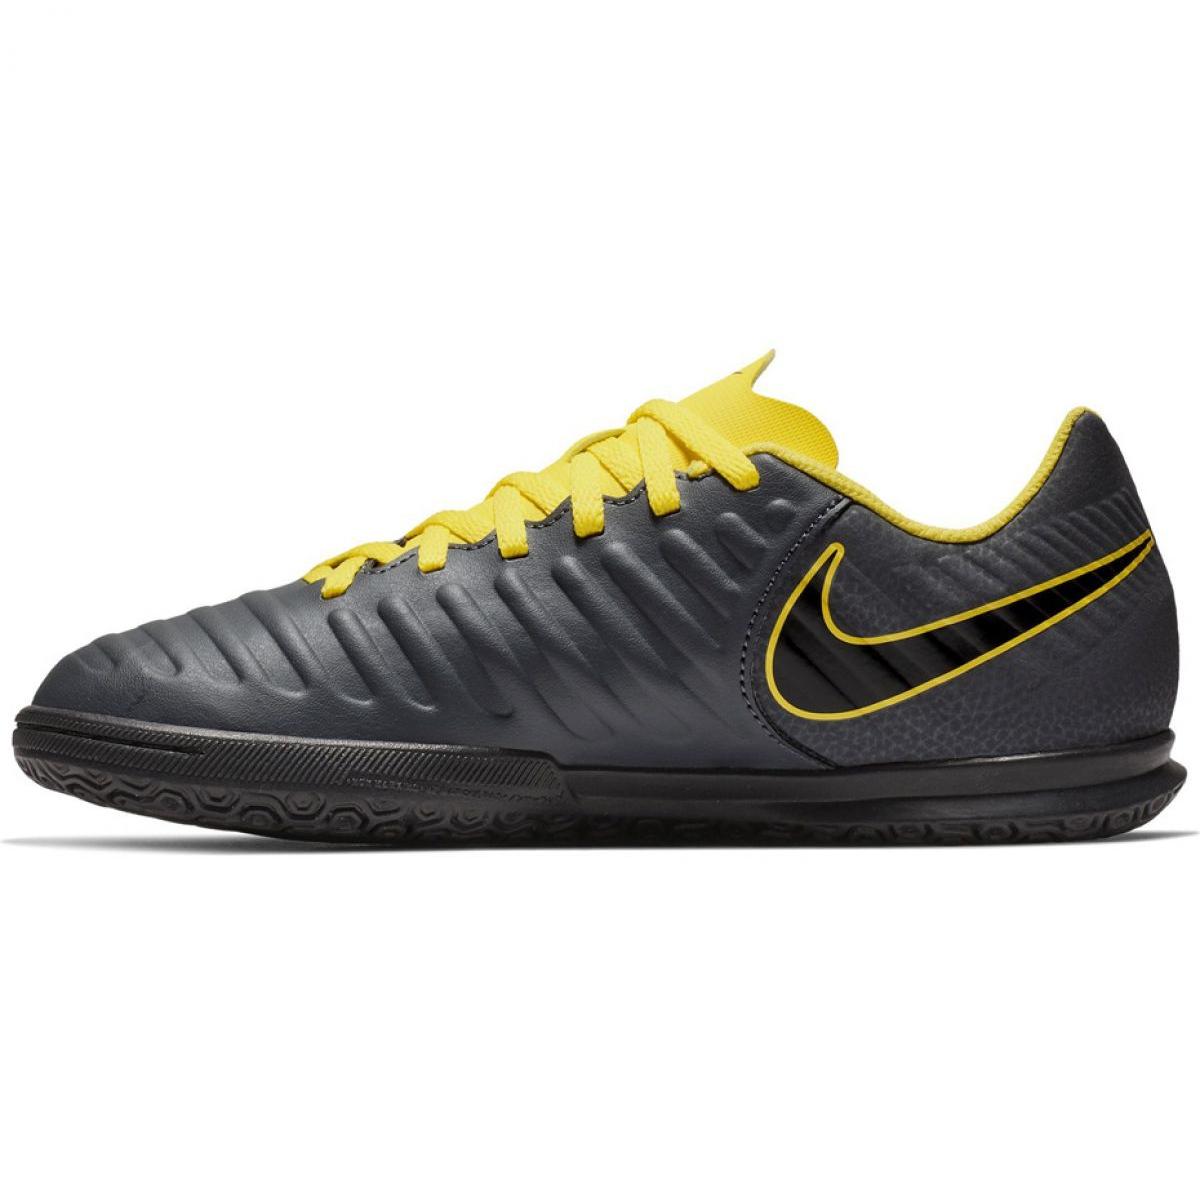 more photos 82d21 cd084 Indoor shoes Nike Tiempo Legend 7 Club Ic Jr AH7260-070